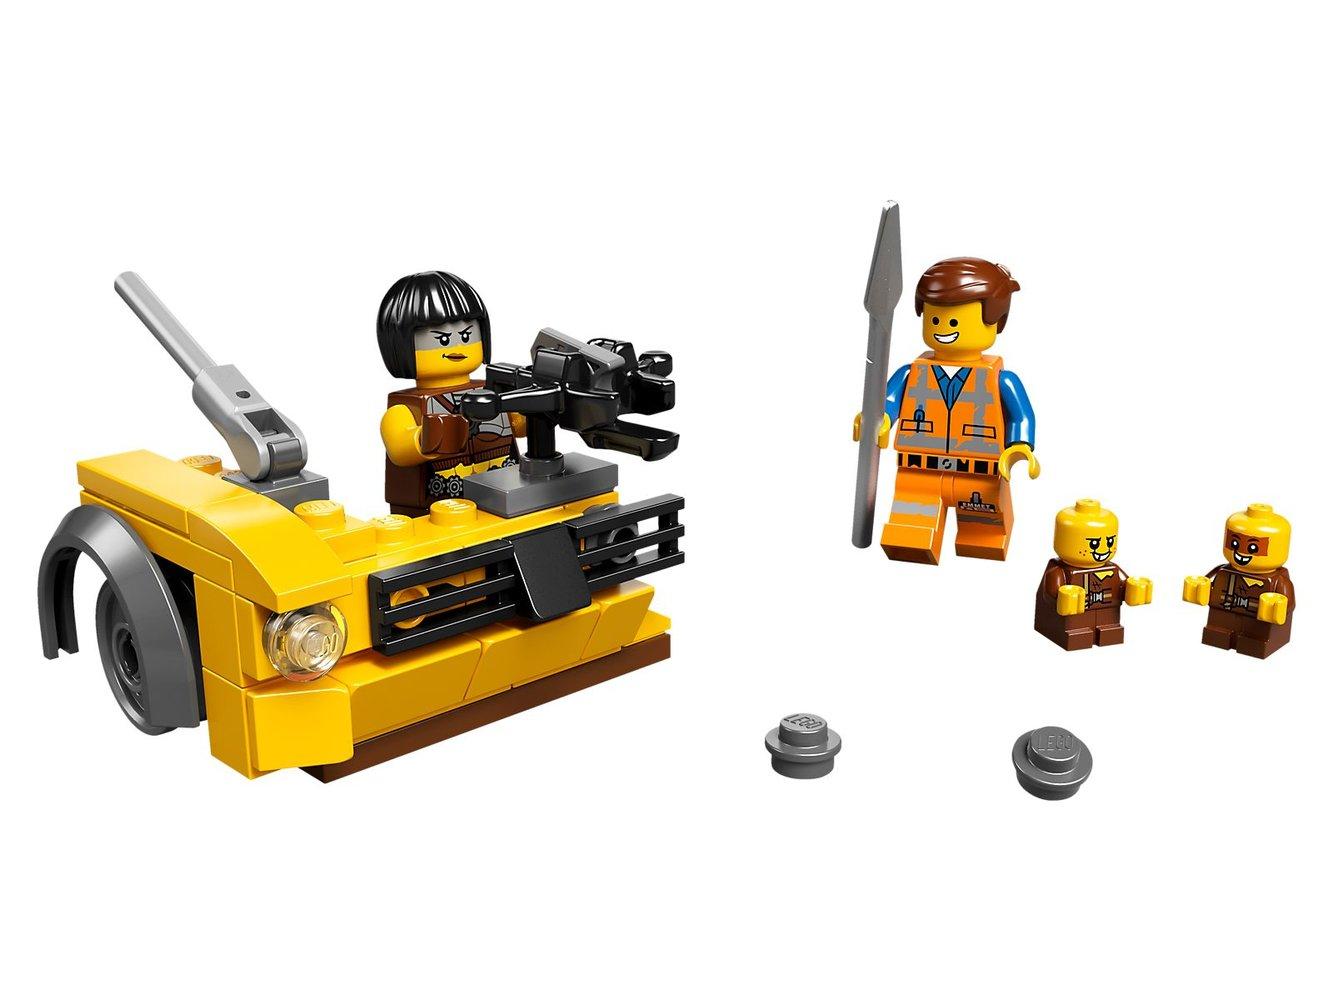 The LEGO Movie 2 Accessory Set